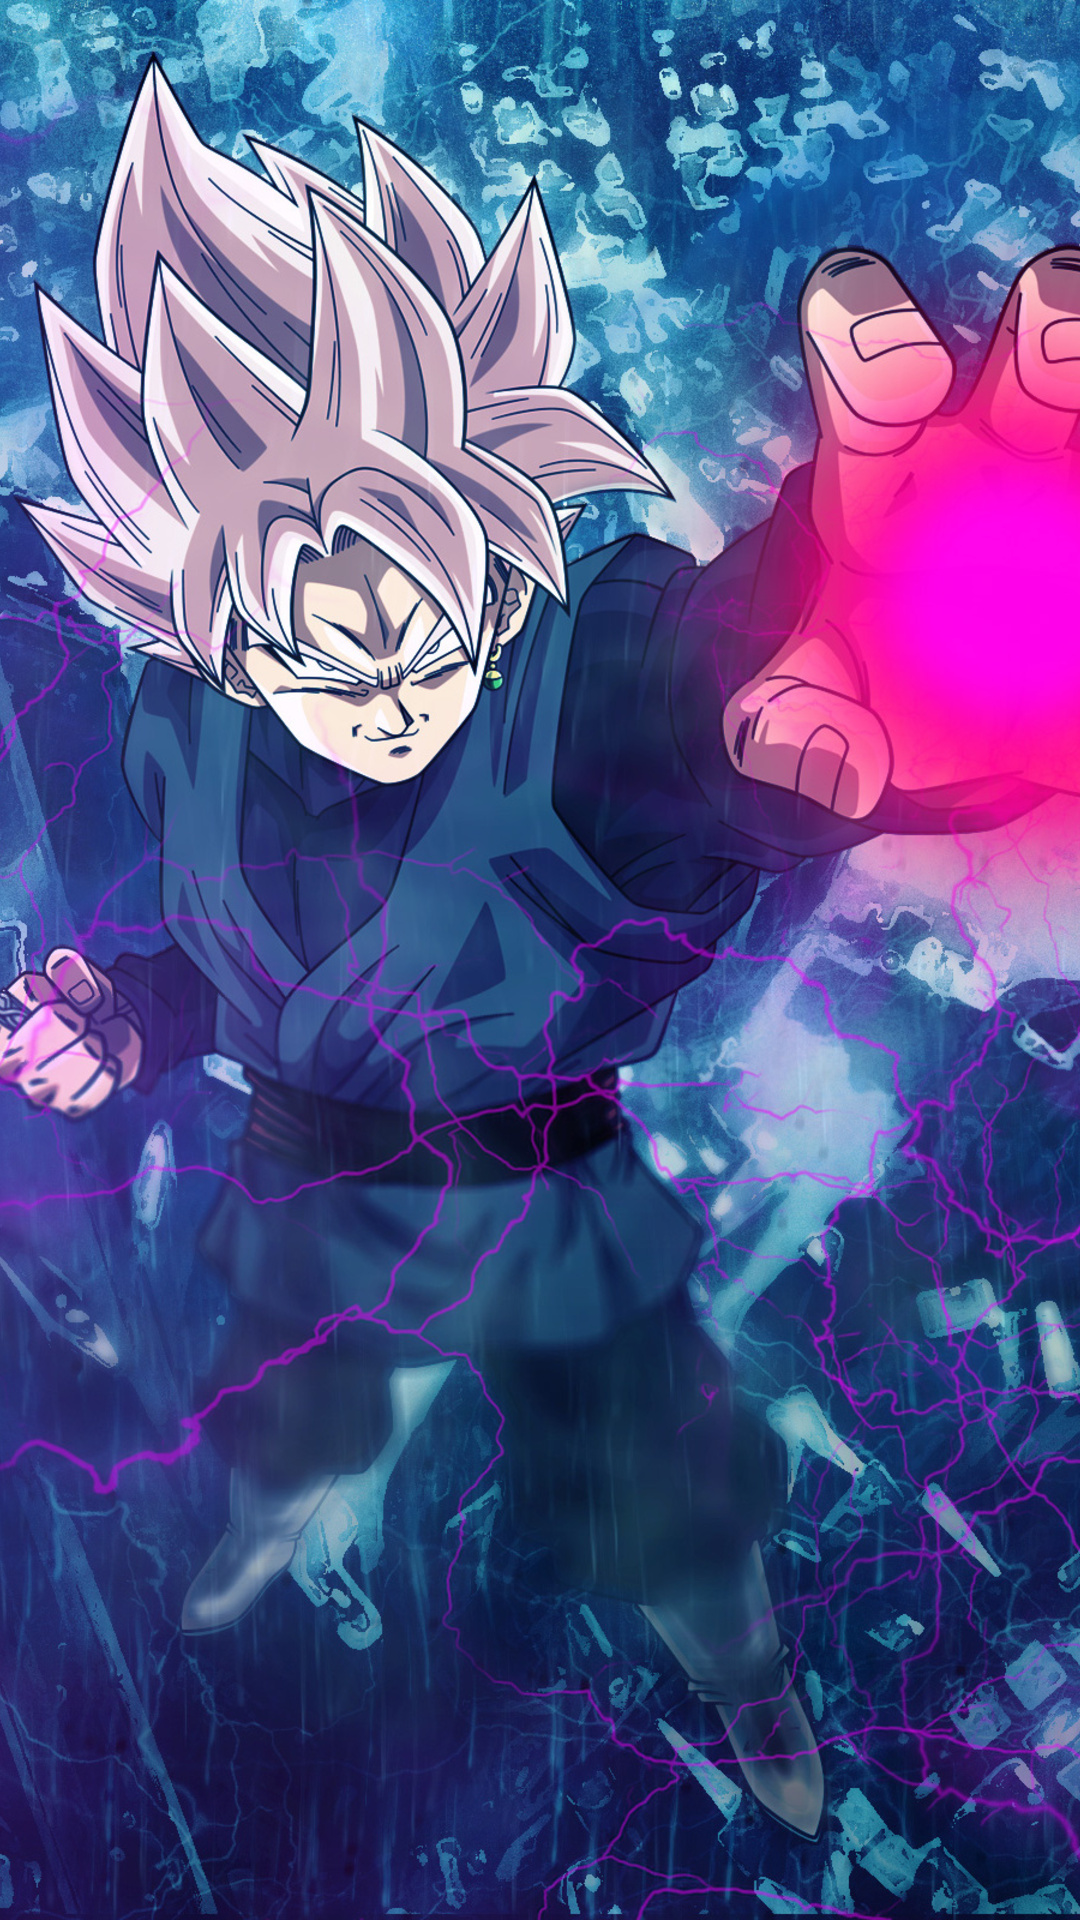 1080x1920 Black Goku Iphone 7,6s,6 Plus, Pixel xl ,One ...